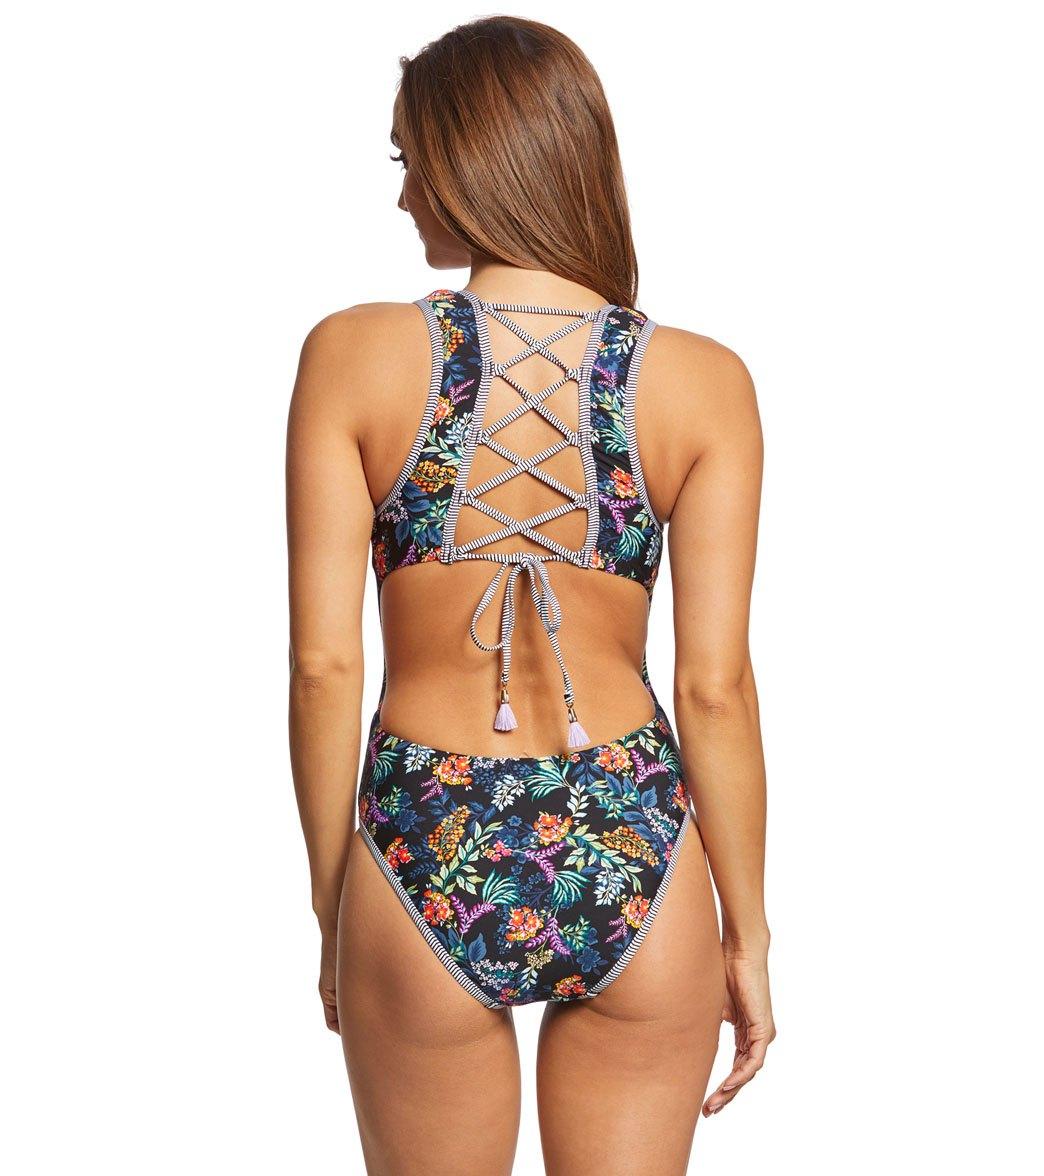 eba3808659 Lucky Brand Sunset Boulevard One Piece Swimsuit at SwimOutlet.com ...